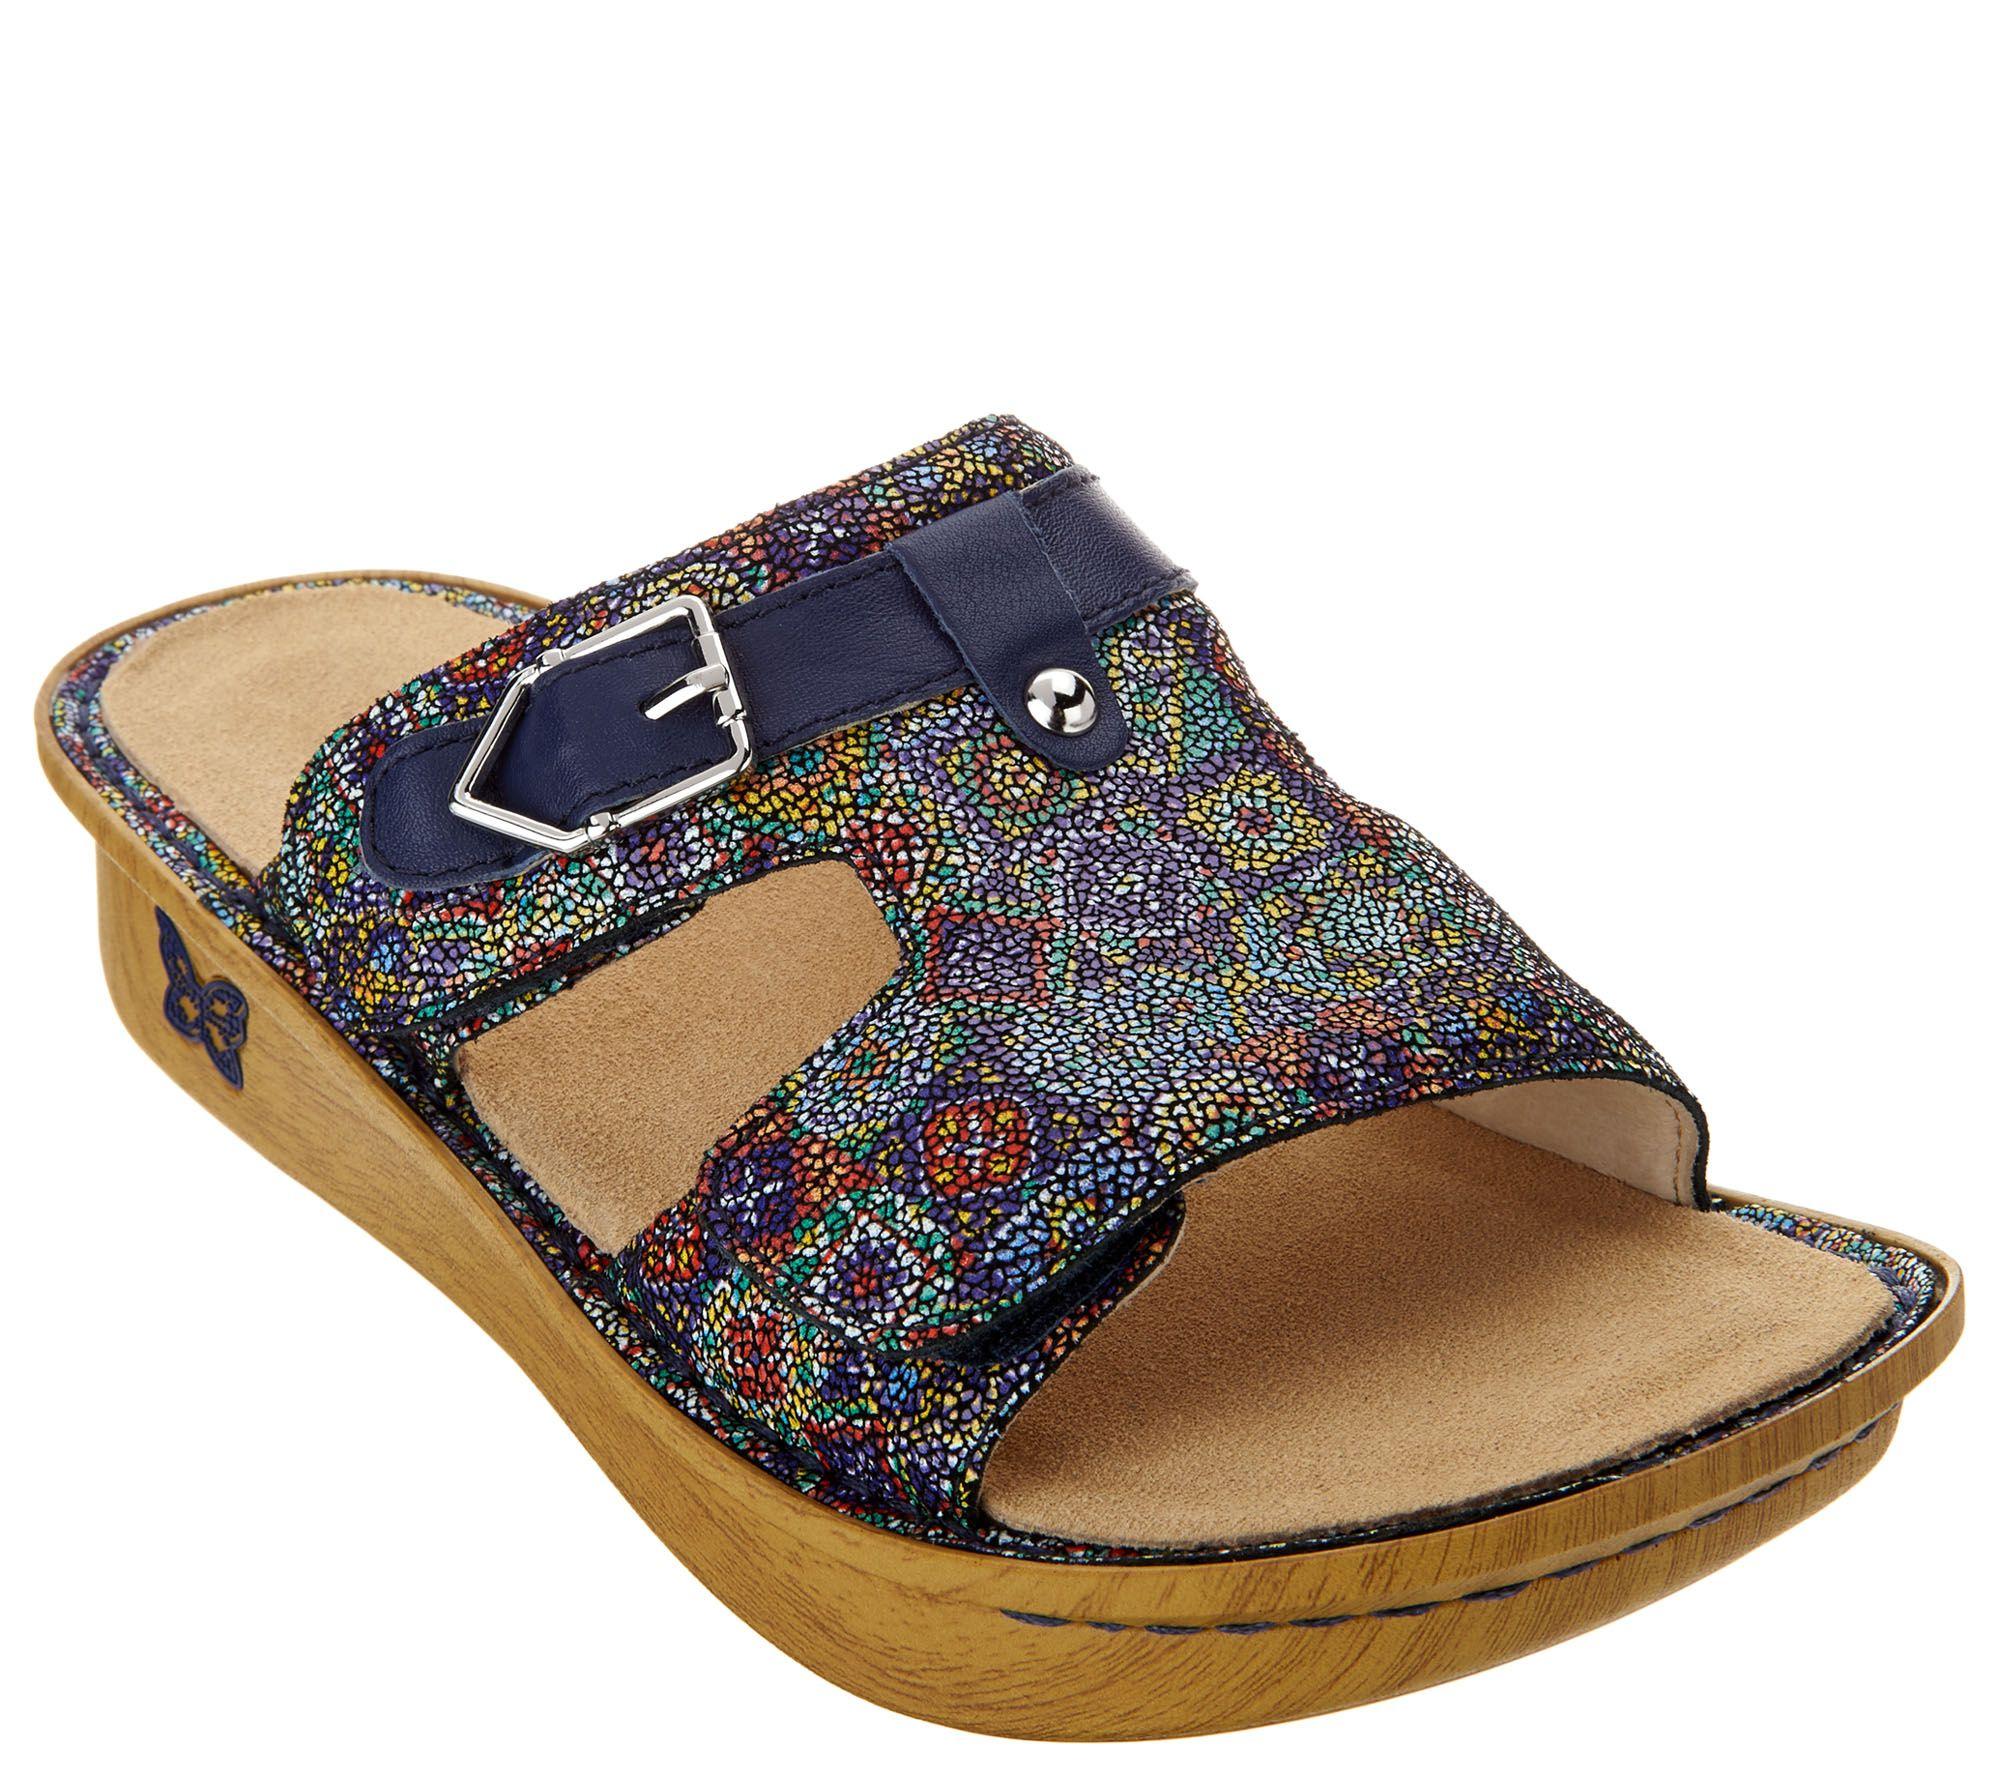 e302bf957e8 Alegria Leather Adjustable Slide Sandals - Peggy - Page 1 — QVC.com